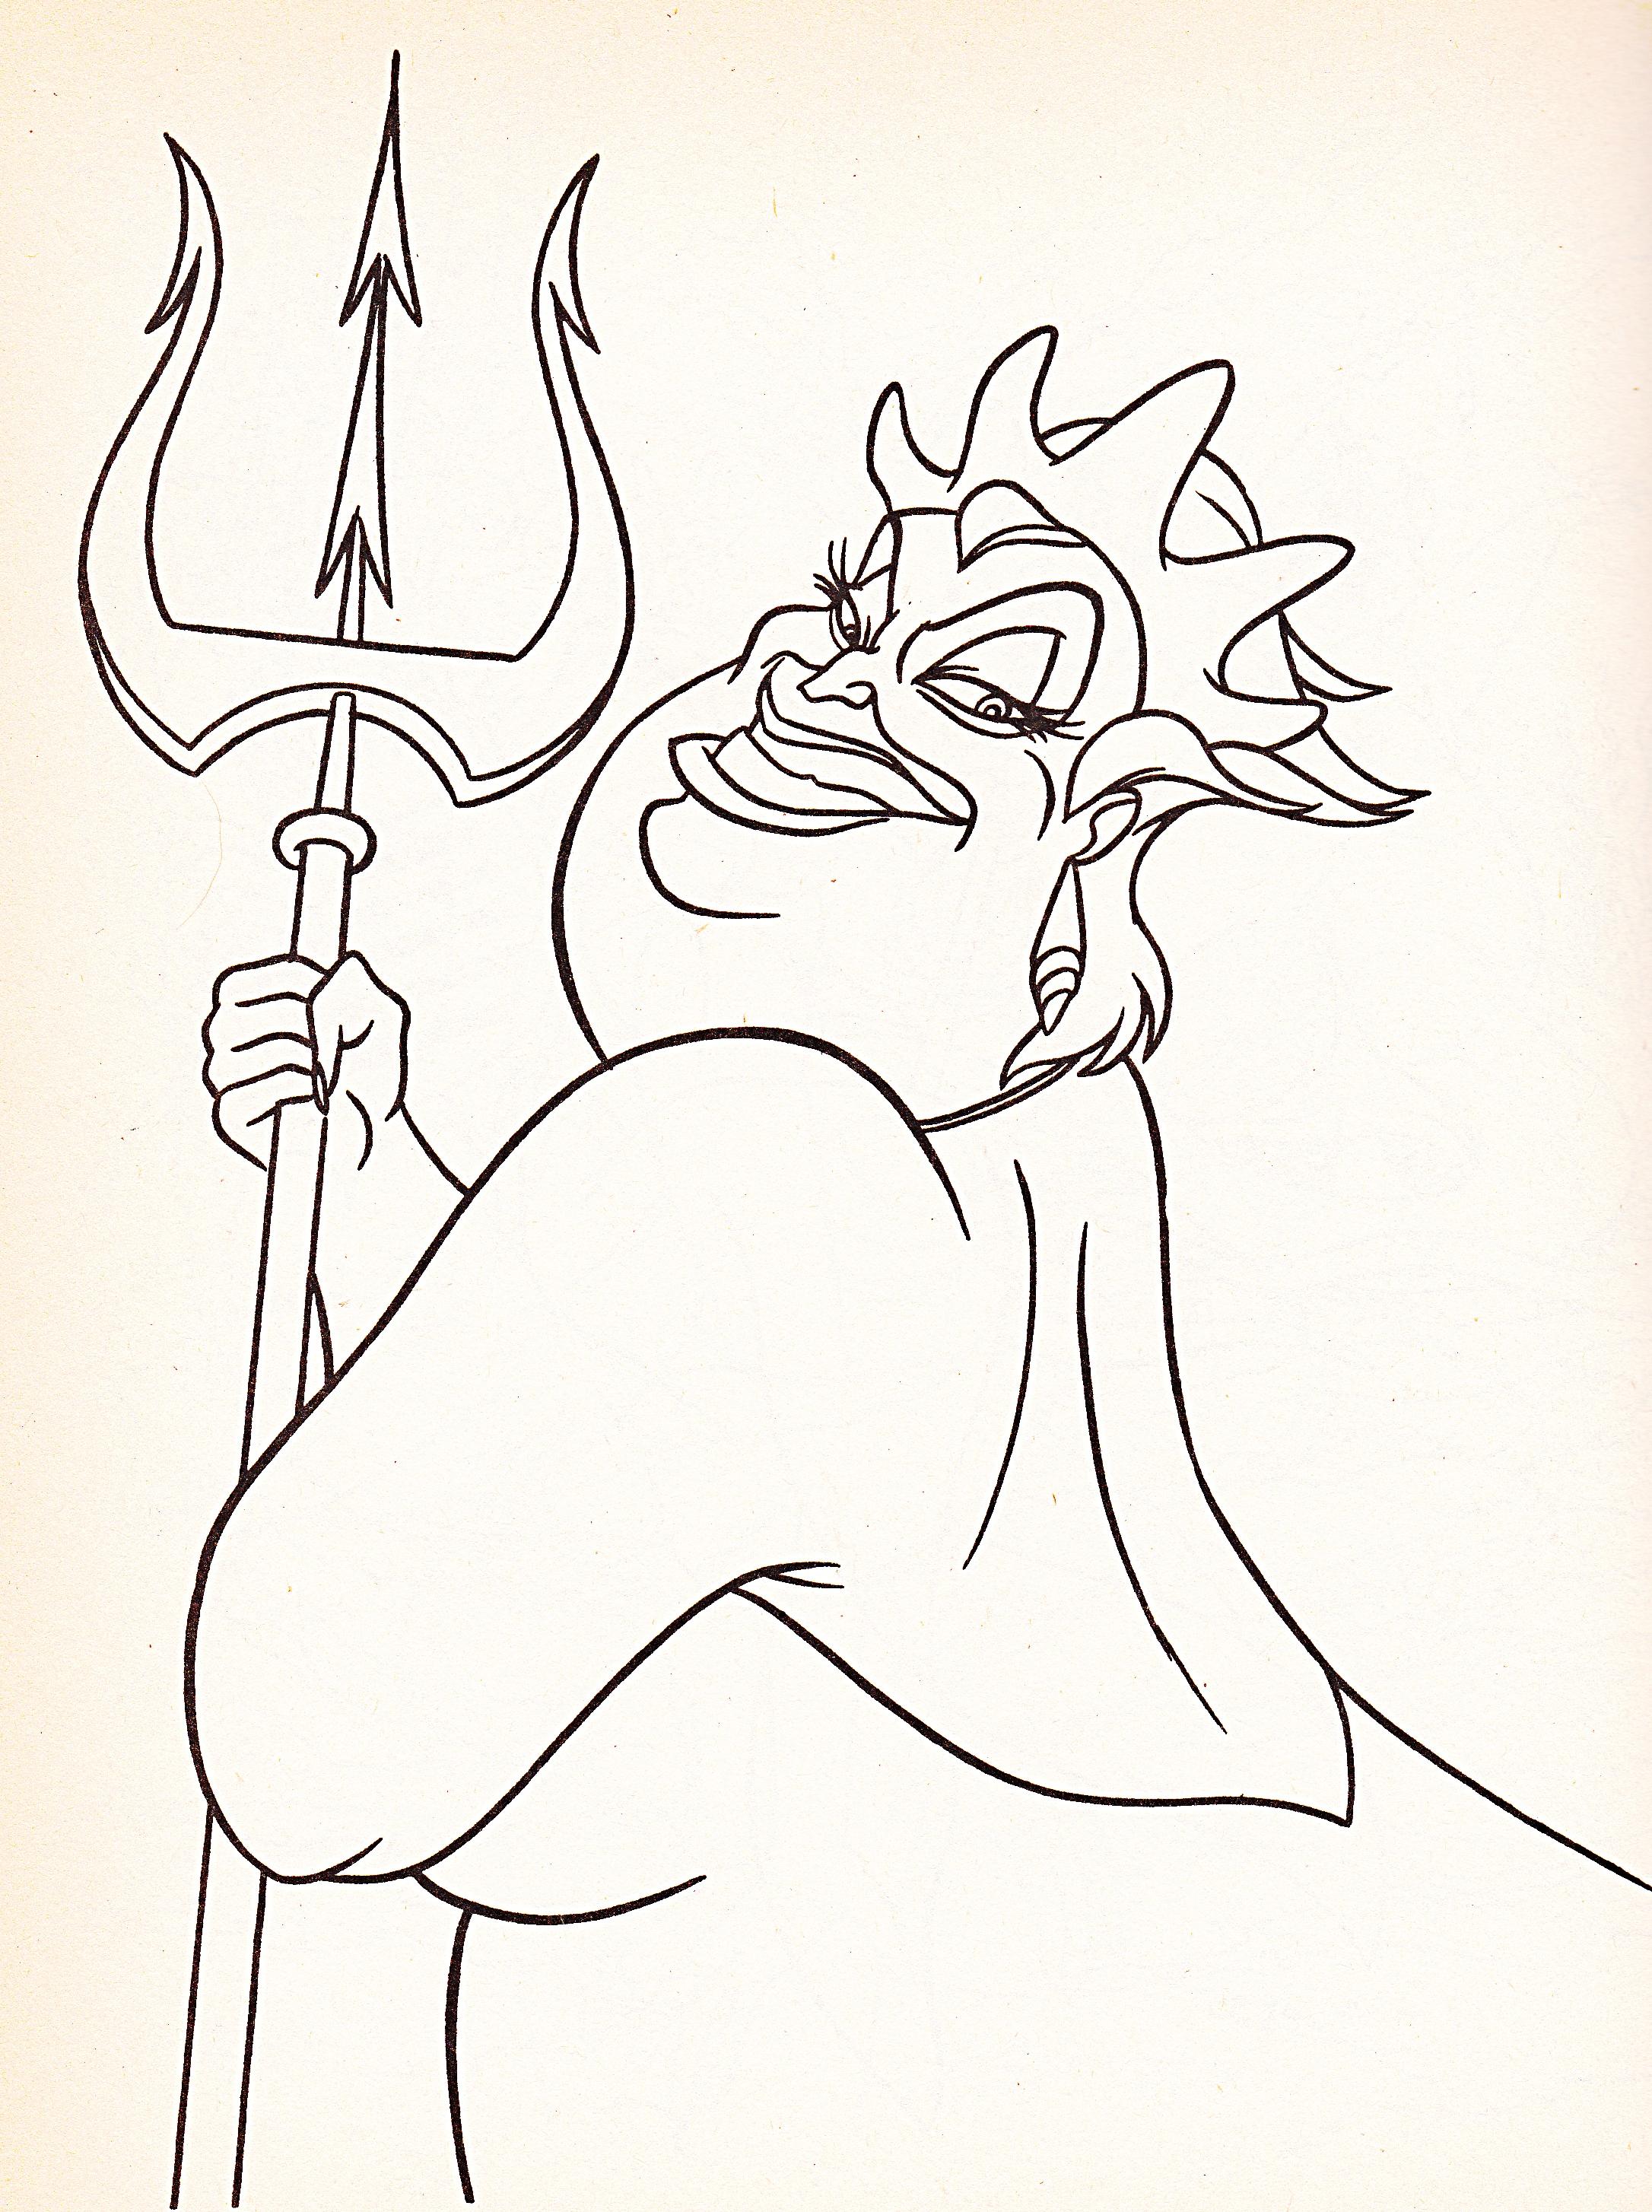 Disney Ursula Coloring Pages : Walt disney coloring pages ursula